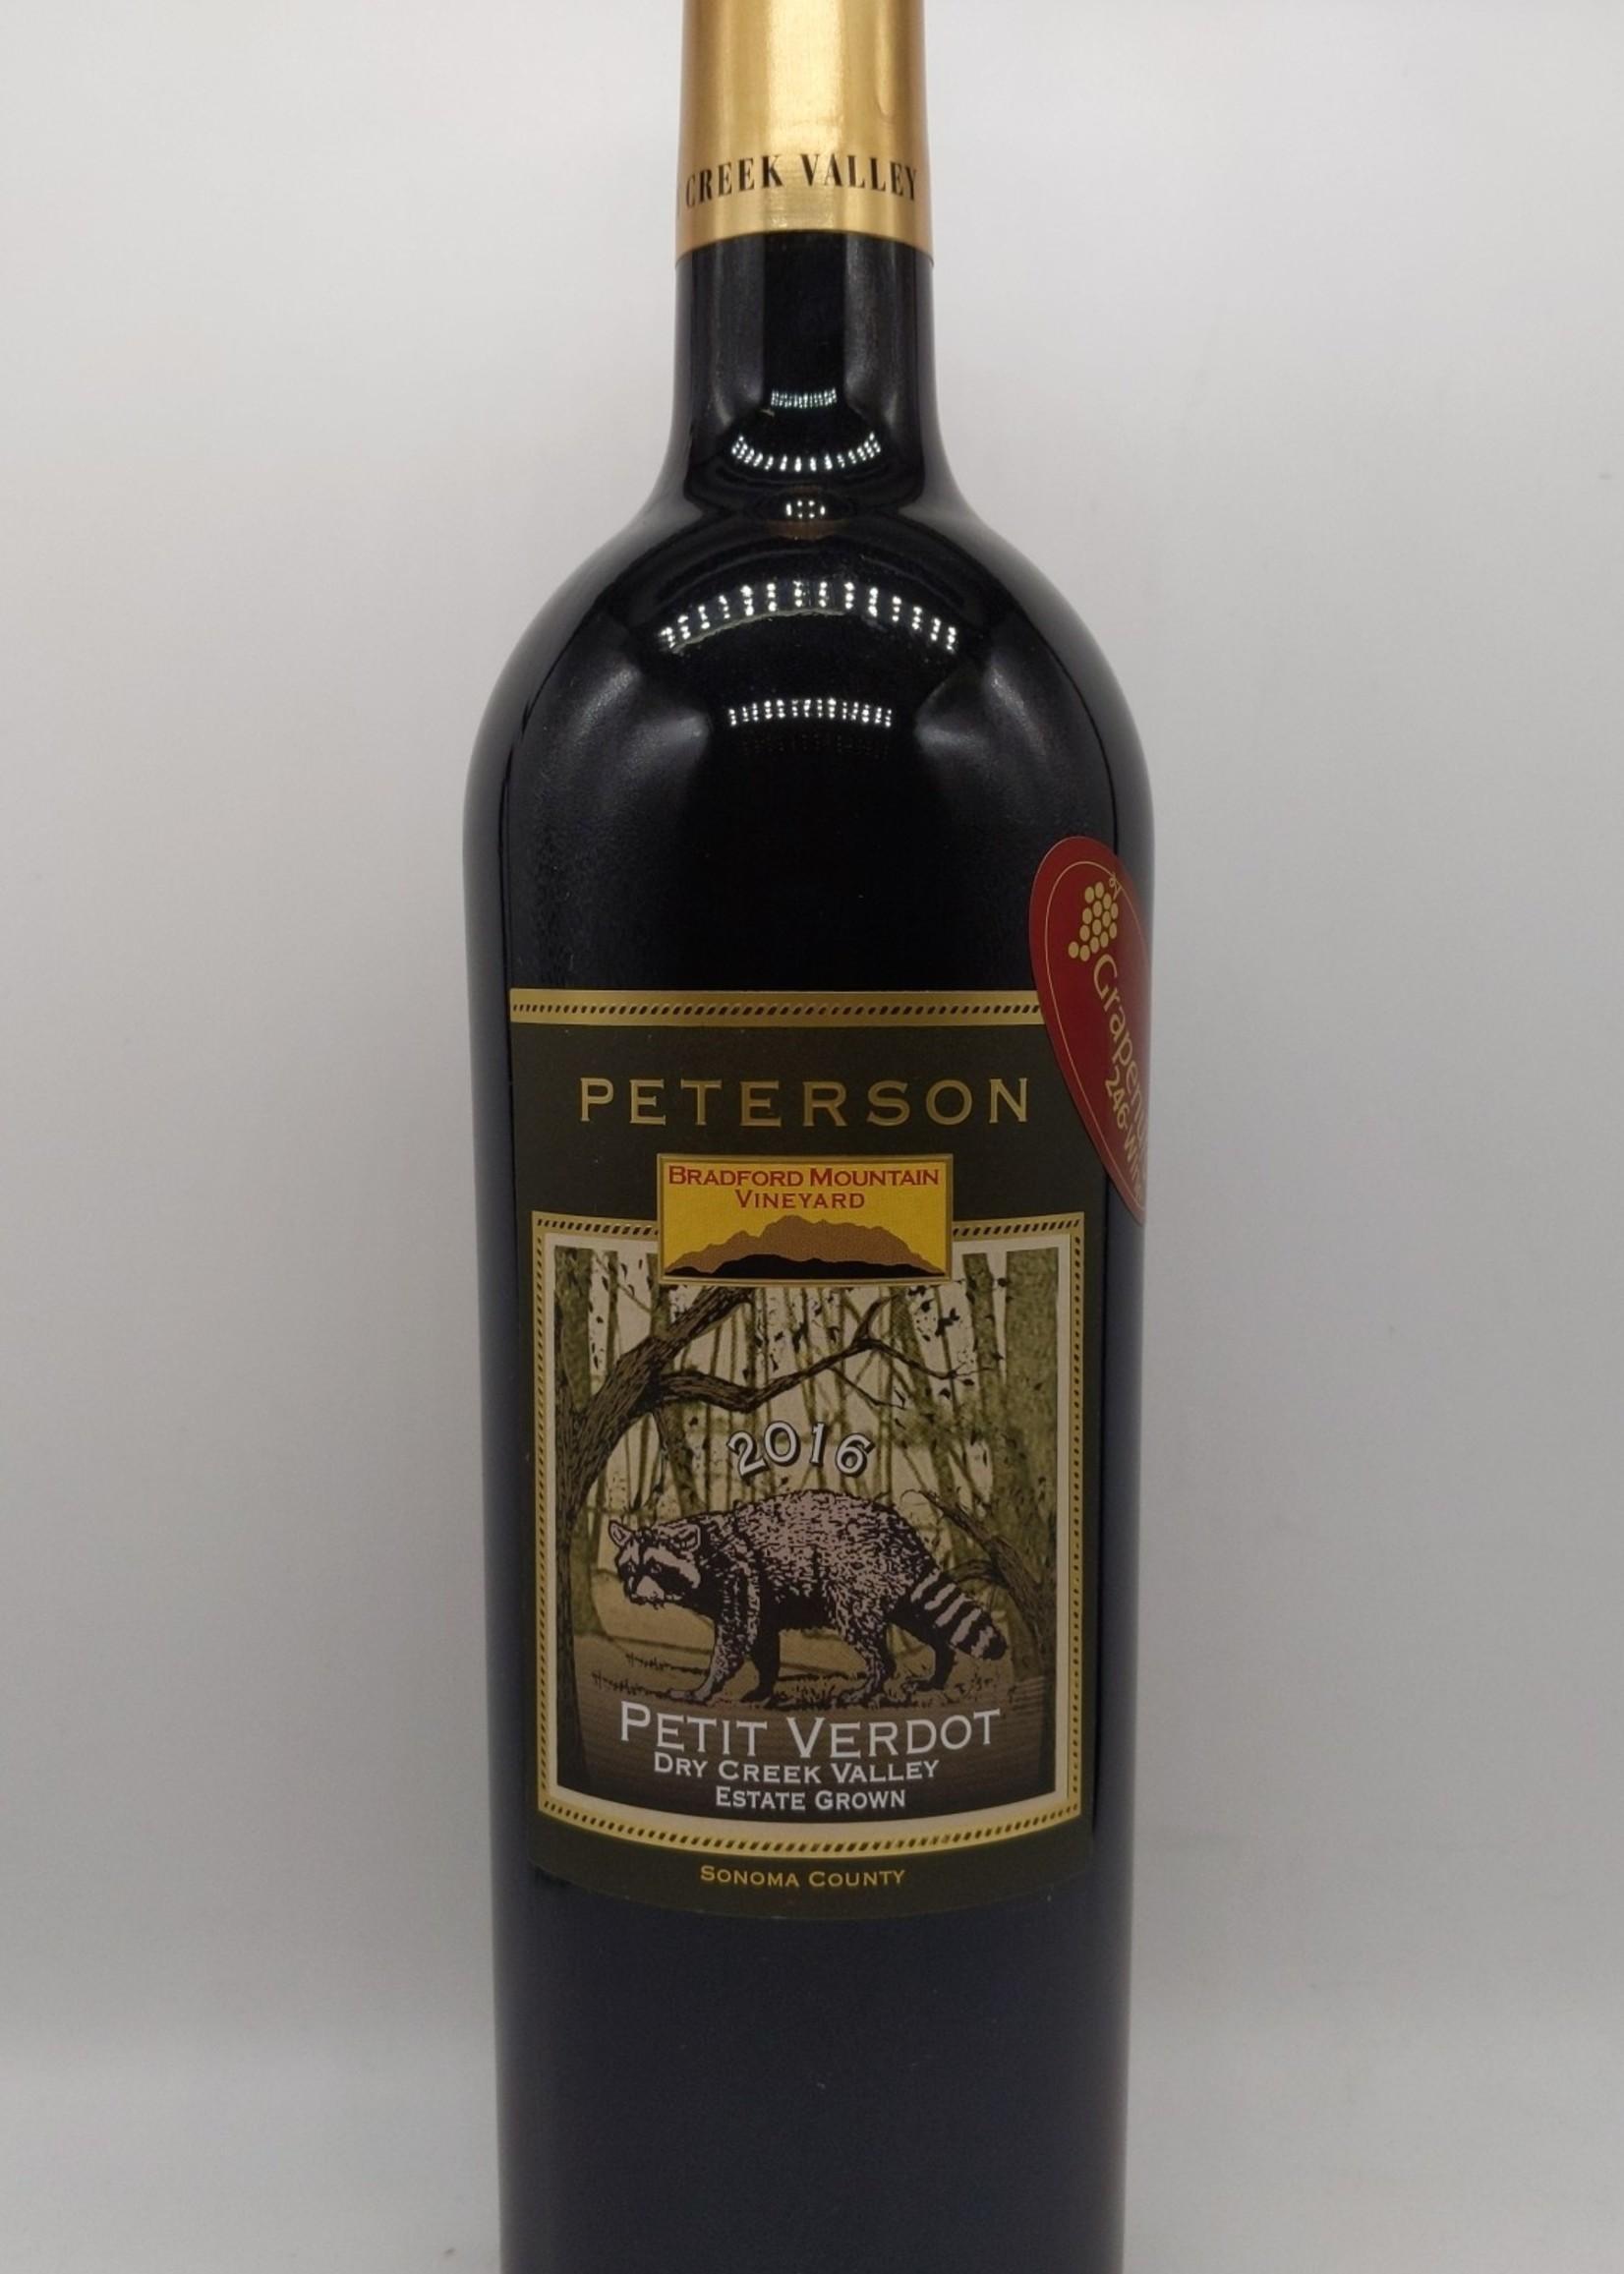 2016 PETERSON BRADFORD MOUNTAIN PETIT VERDOT 750ml